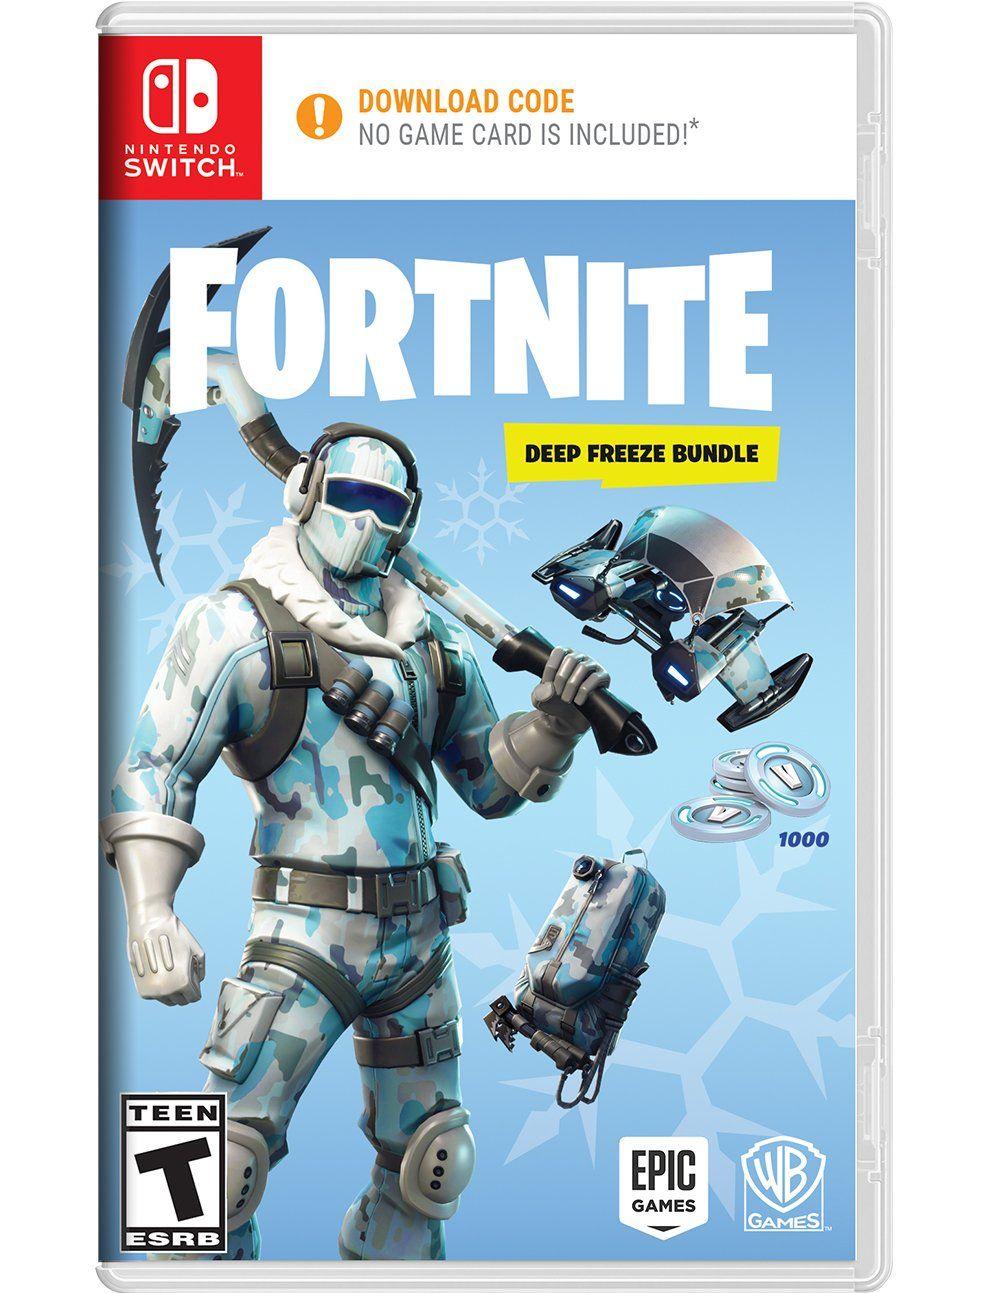 Fortnite Deep Freeze Bundle Nintendo Switch In 2020 Fortnite Nintendo Switch Epic Games Fortnite